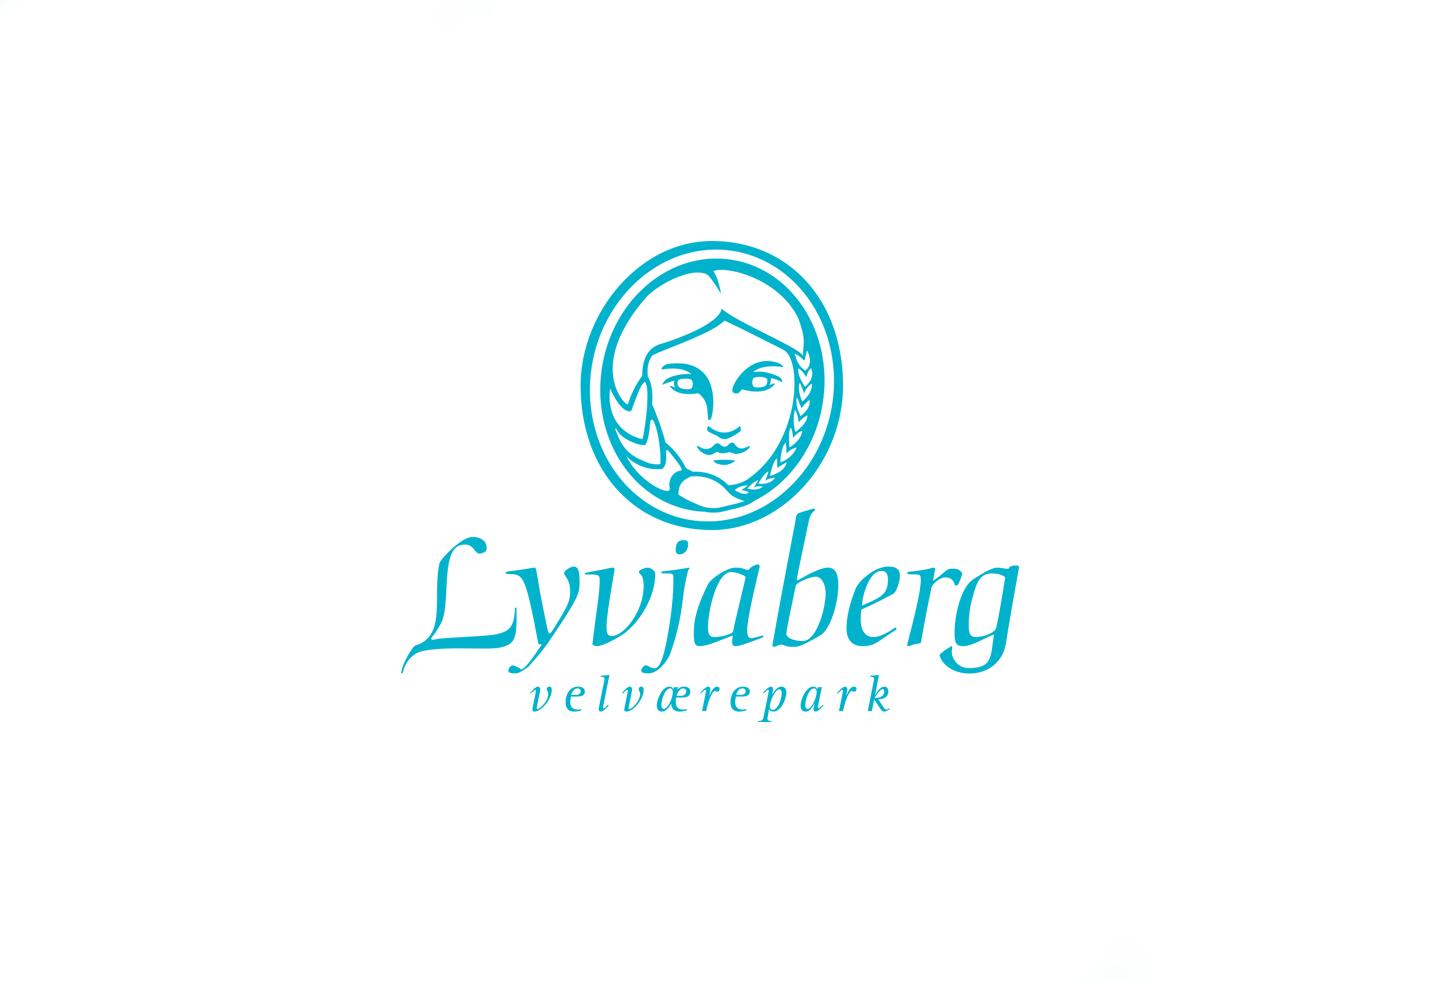 lyvjaberg2